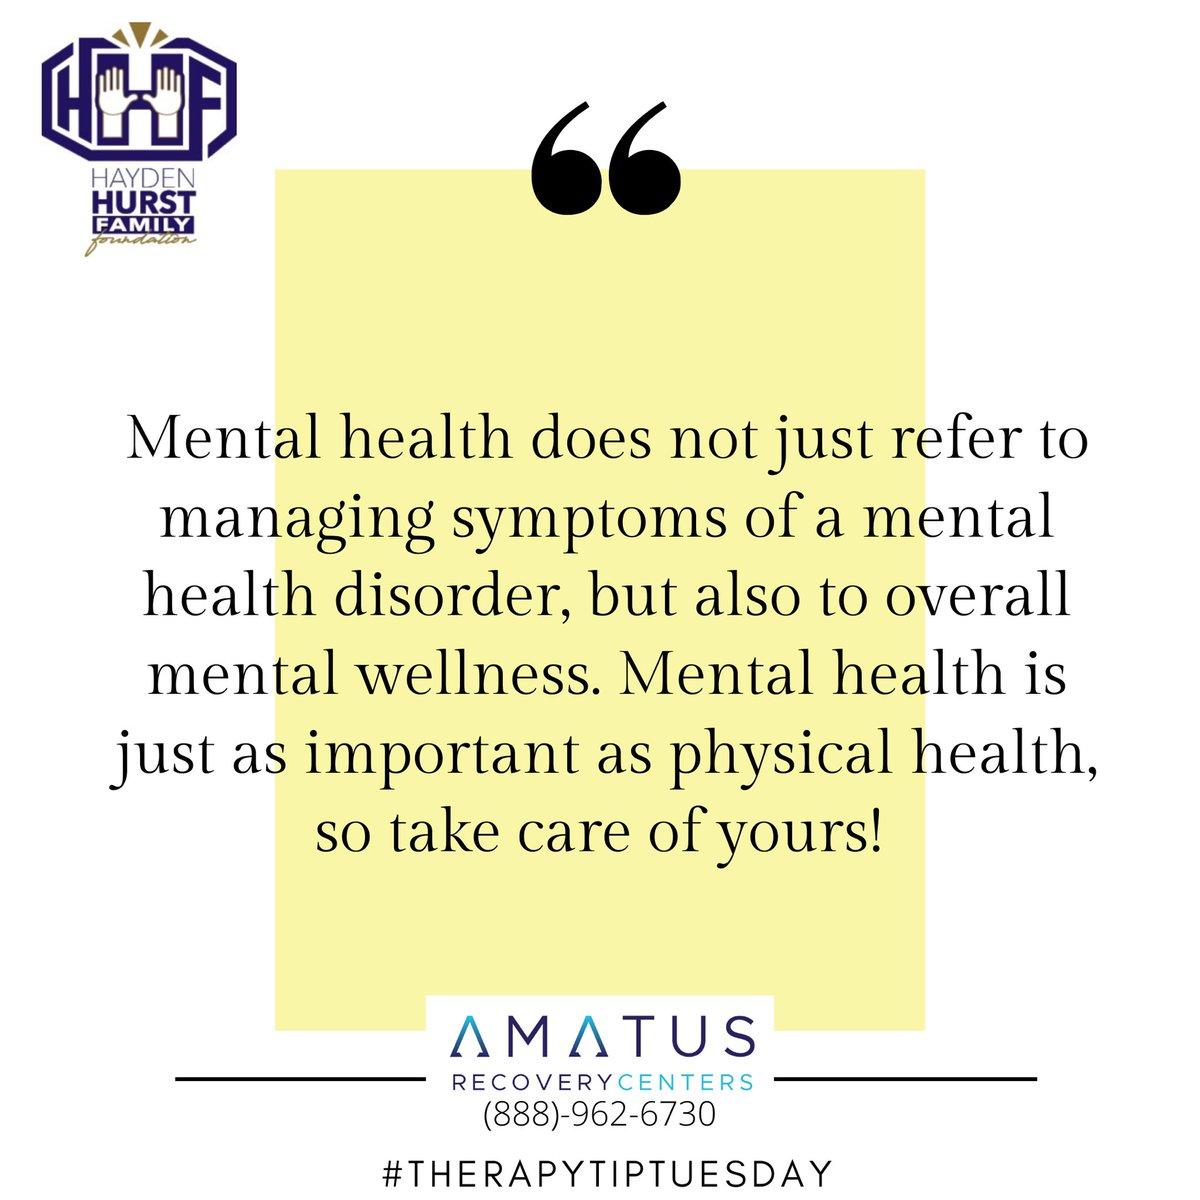 #TherapyTipTuesday https://t.co/iuxm2xxkFF